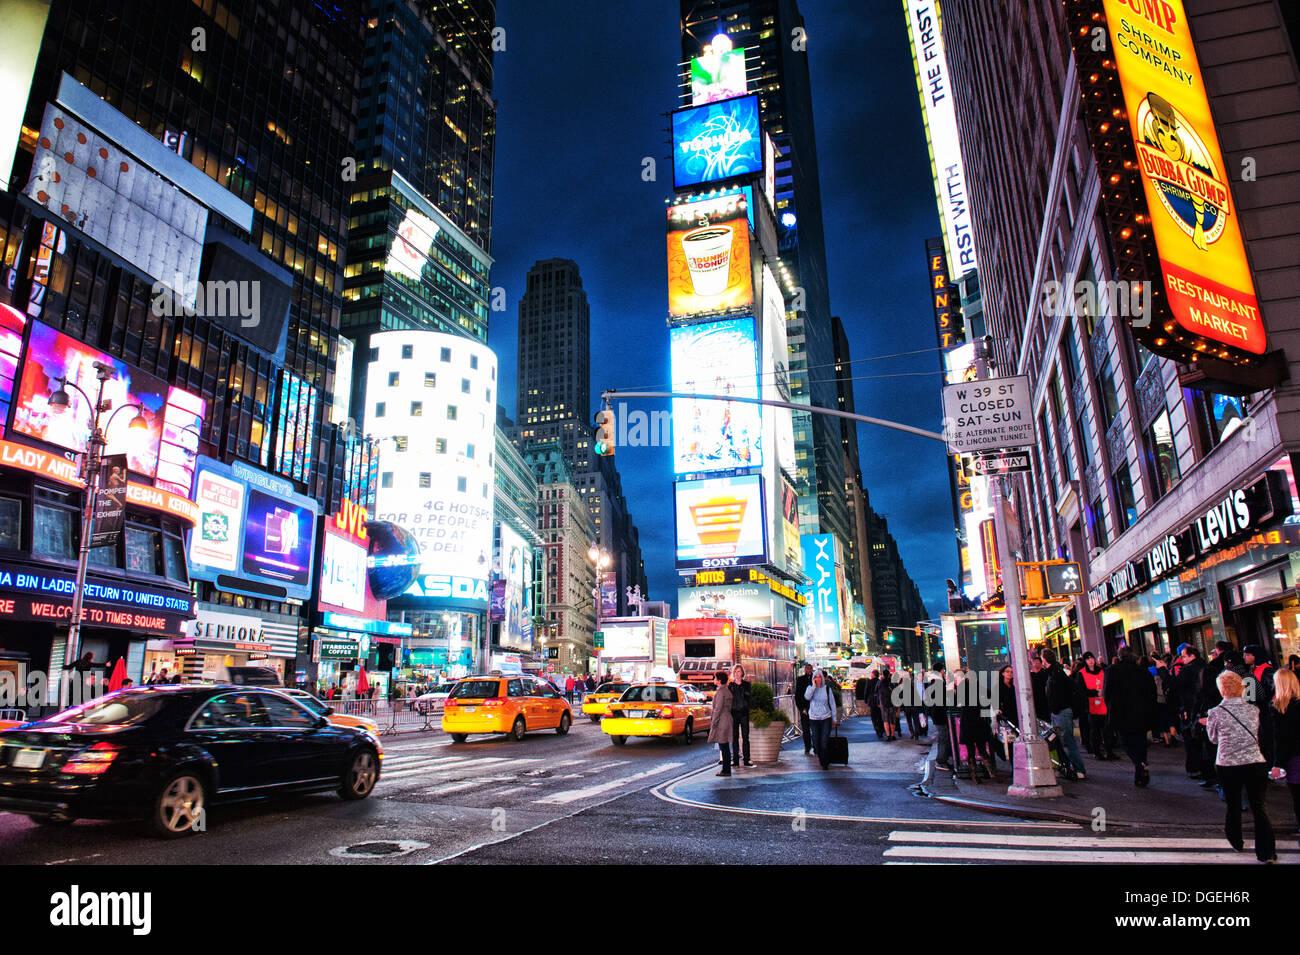 Belebten Times Square bei Nacht in New York City, NY, USA Stockbild